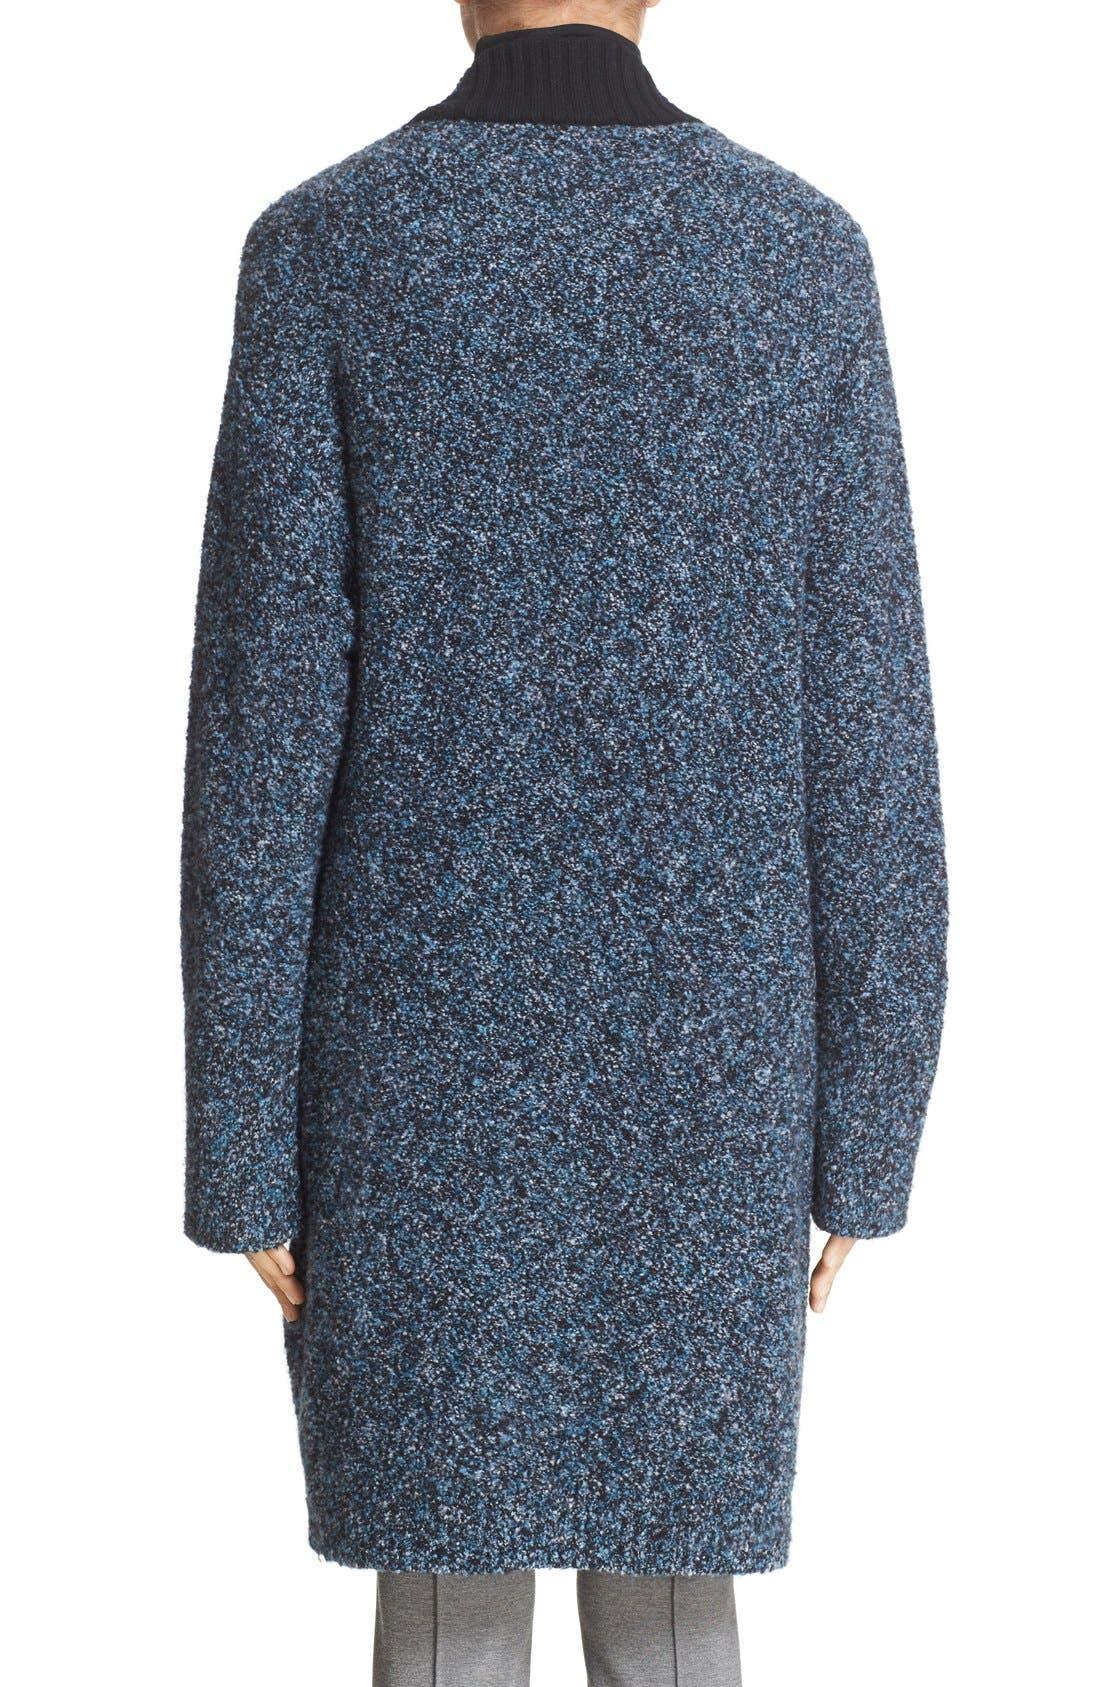 'Diana' Sweater Coat,                             Alternate thumbnail 5, color,                             474